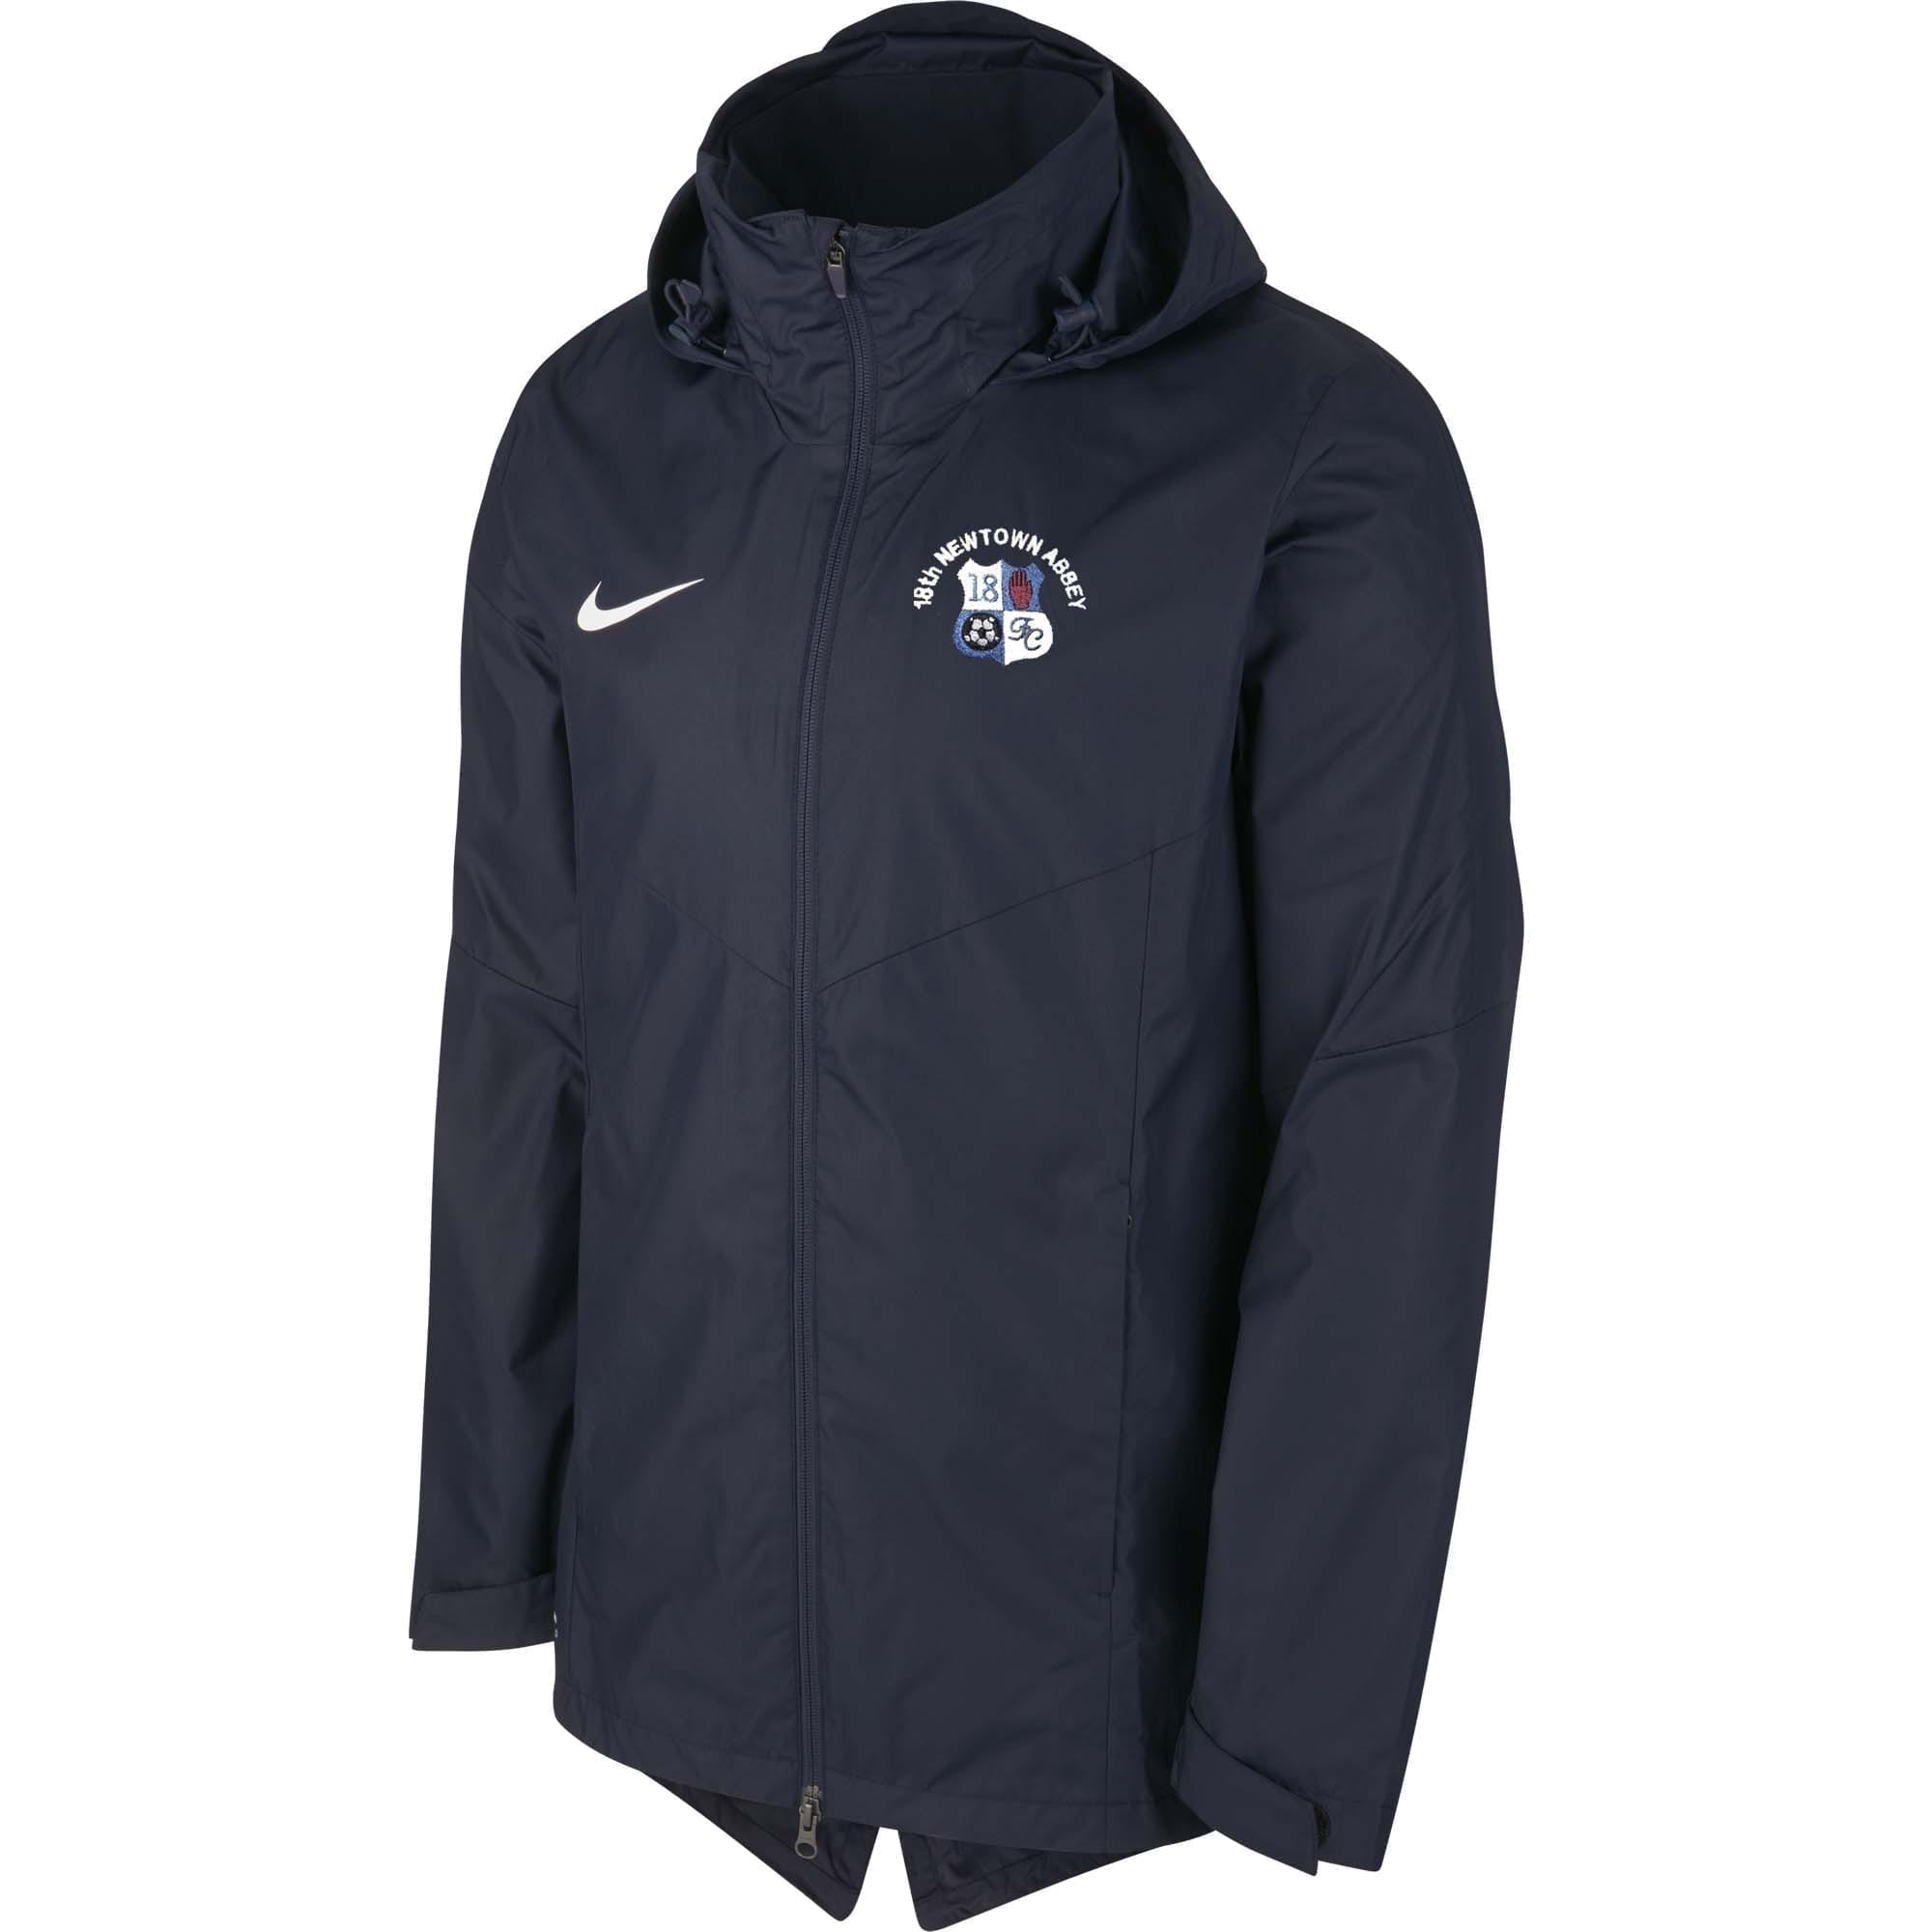 18th newtownabbey rain jacket 30869 p